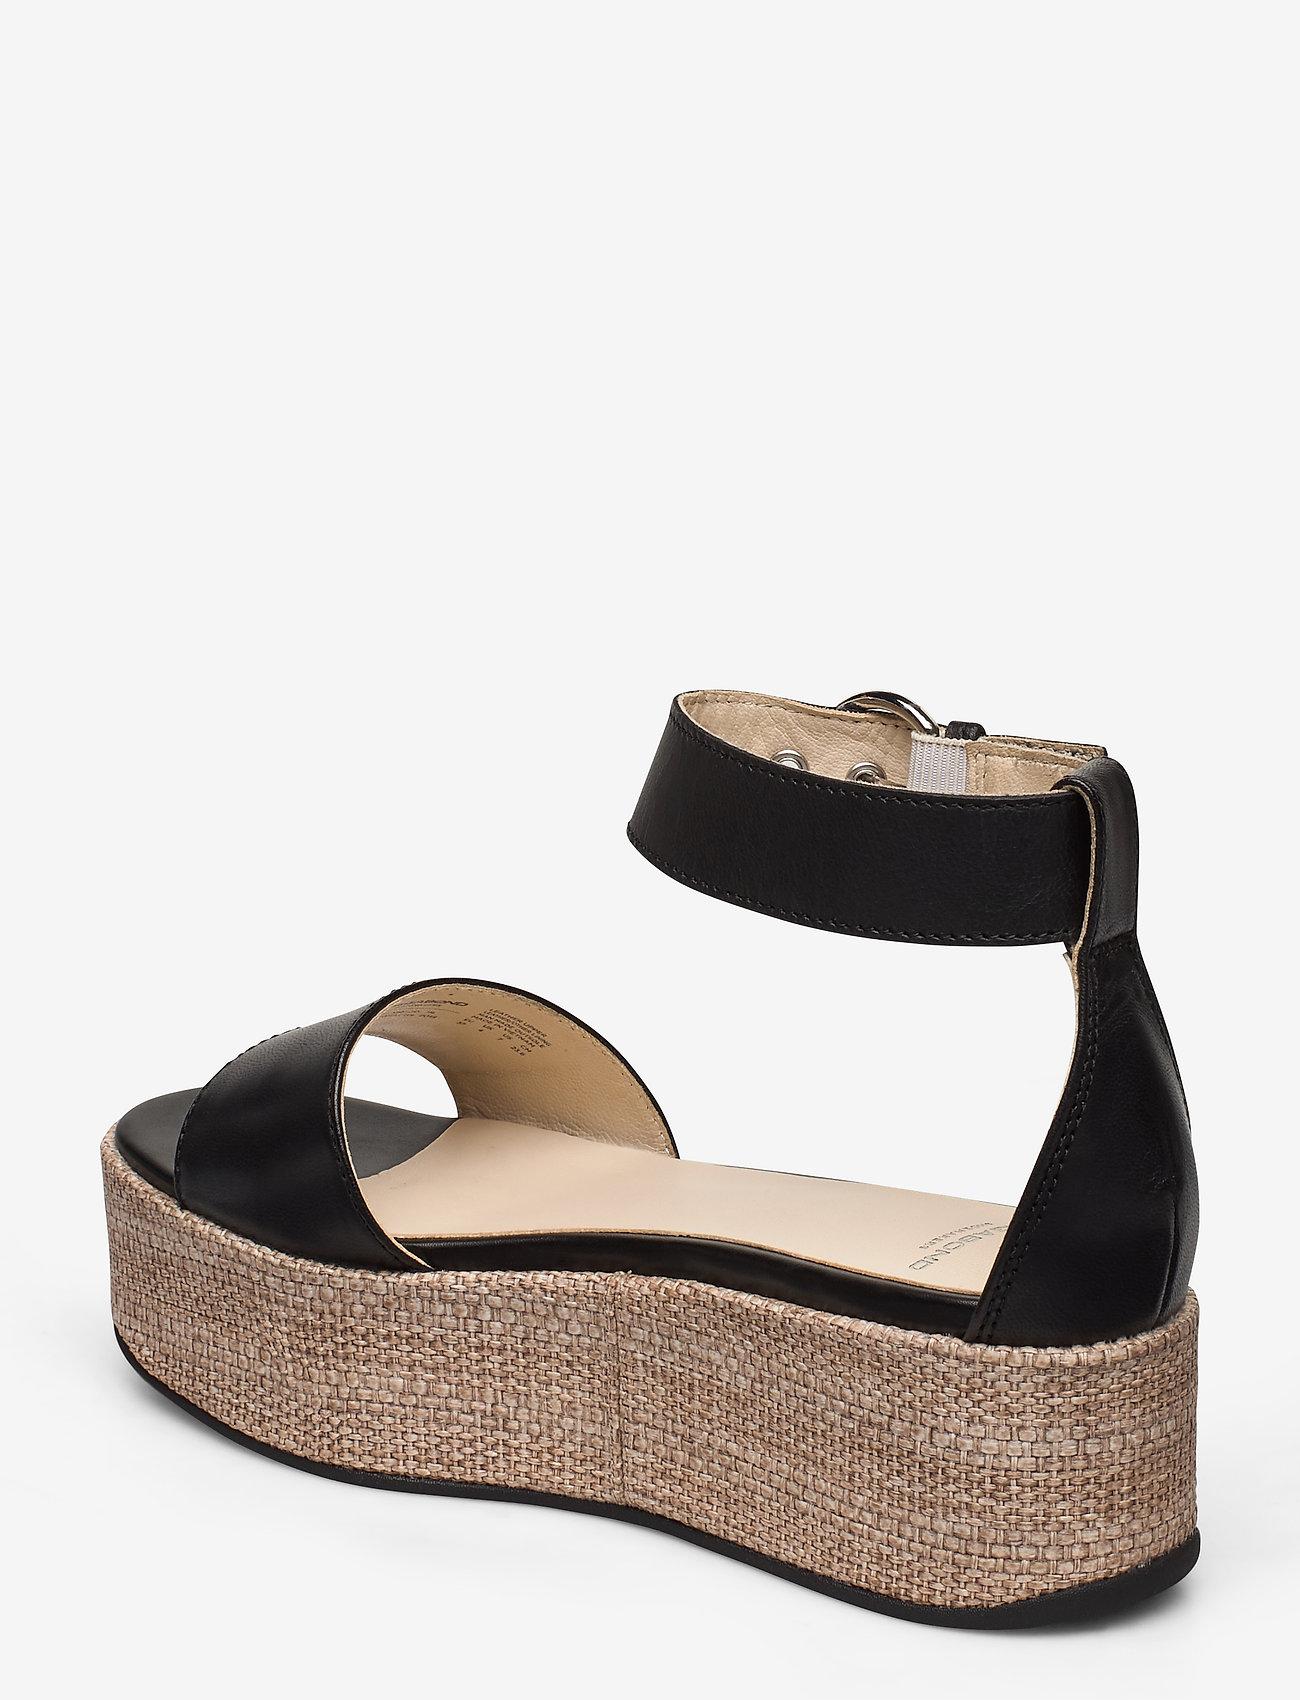 VAGABOND - FELICIA - heeled espadrilles - black - 2